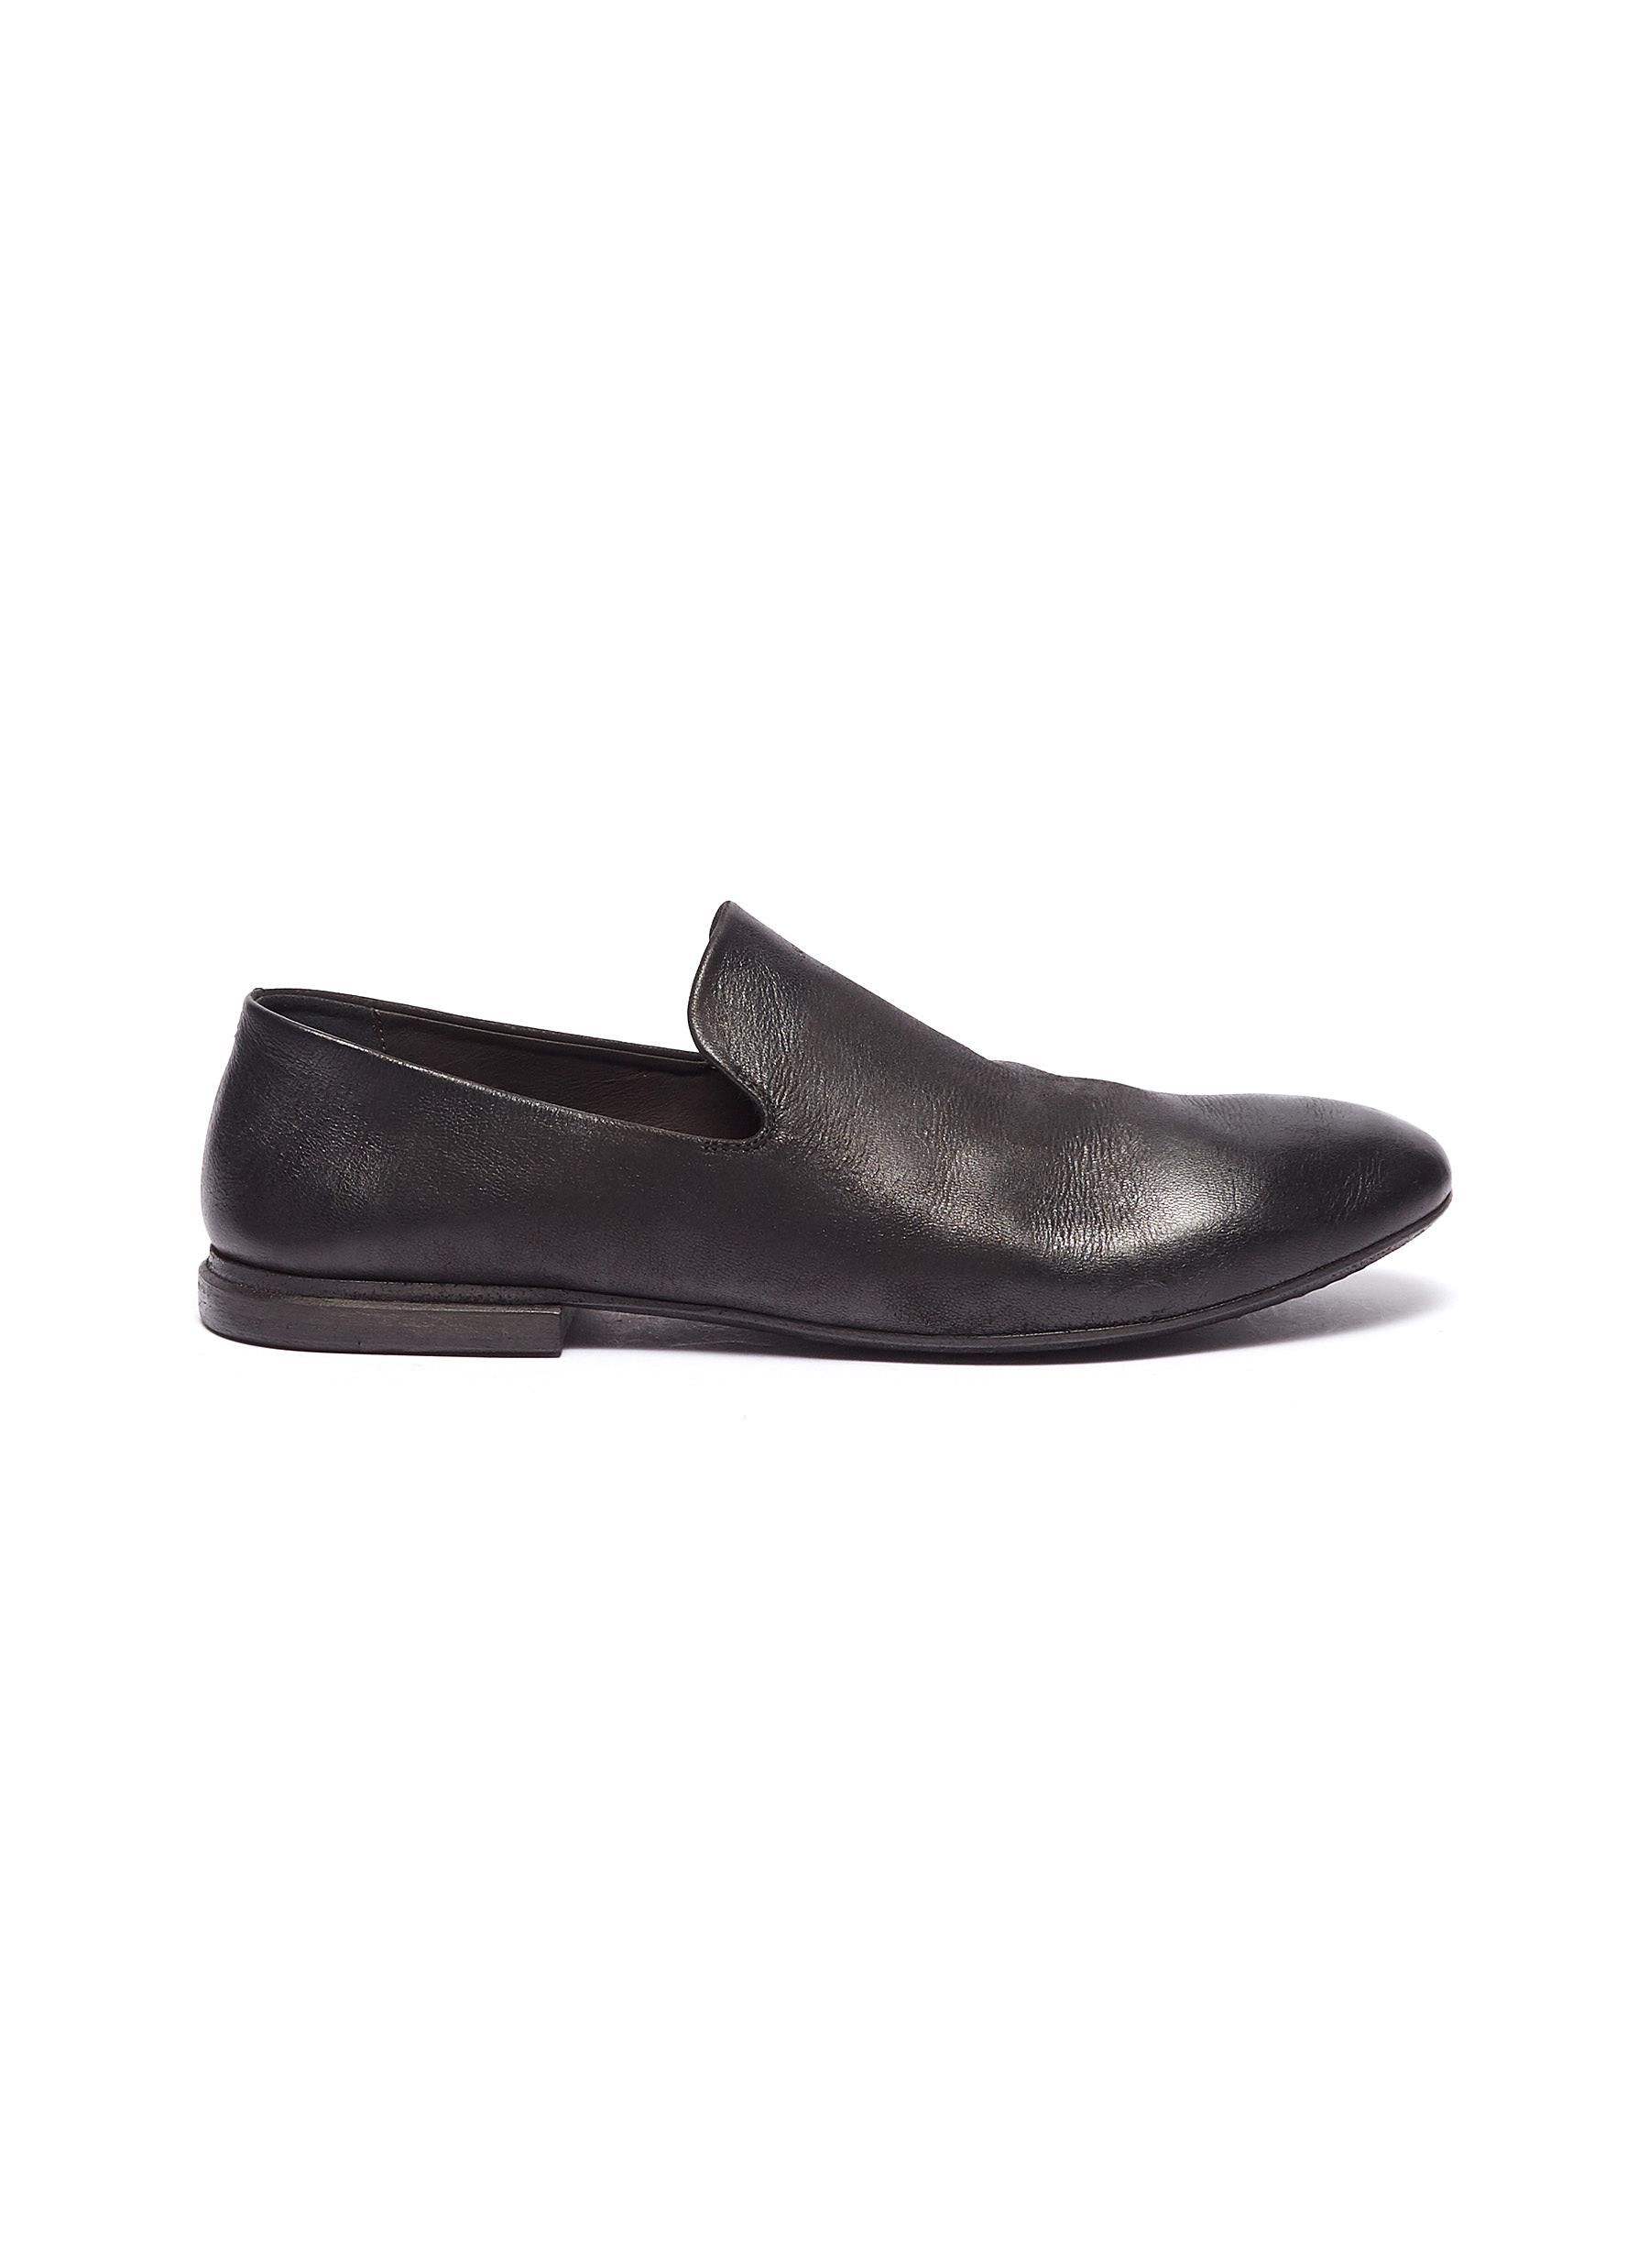 Marsèll 'sdende' Slip Distressed Leather Onsmarsèllshoes AcL435RjqS